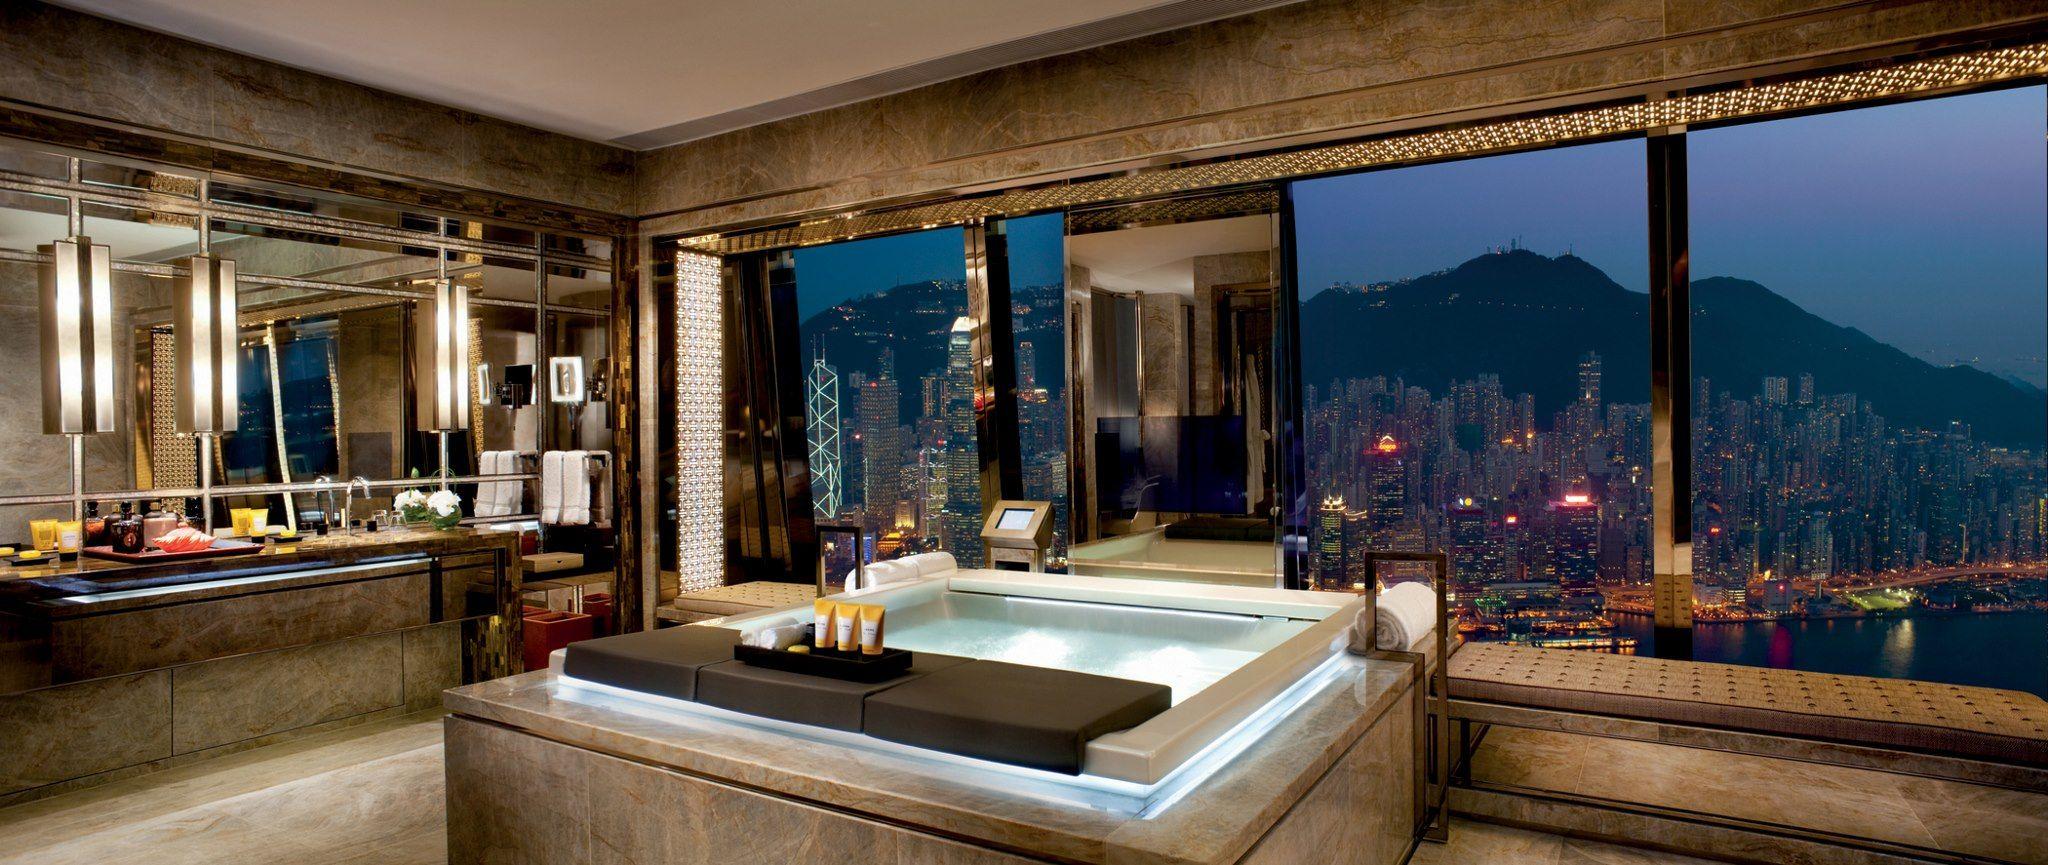 Badezimmerdesign mit jacuzzi the ritz carlton hong kong  cool hotel bathrooms  pinterest